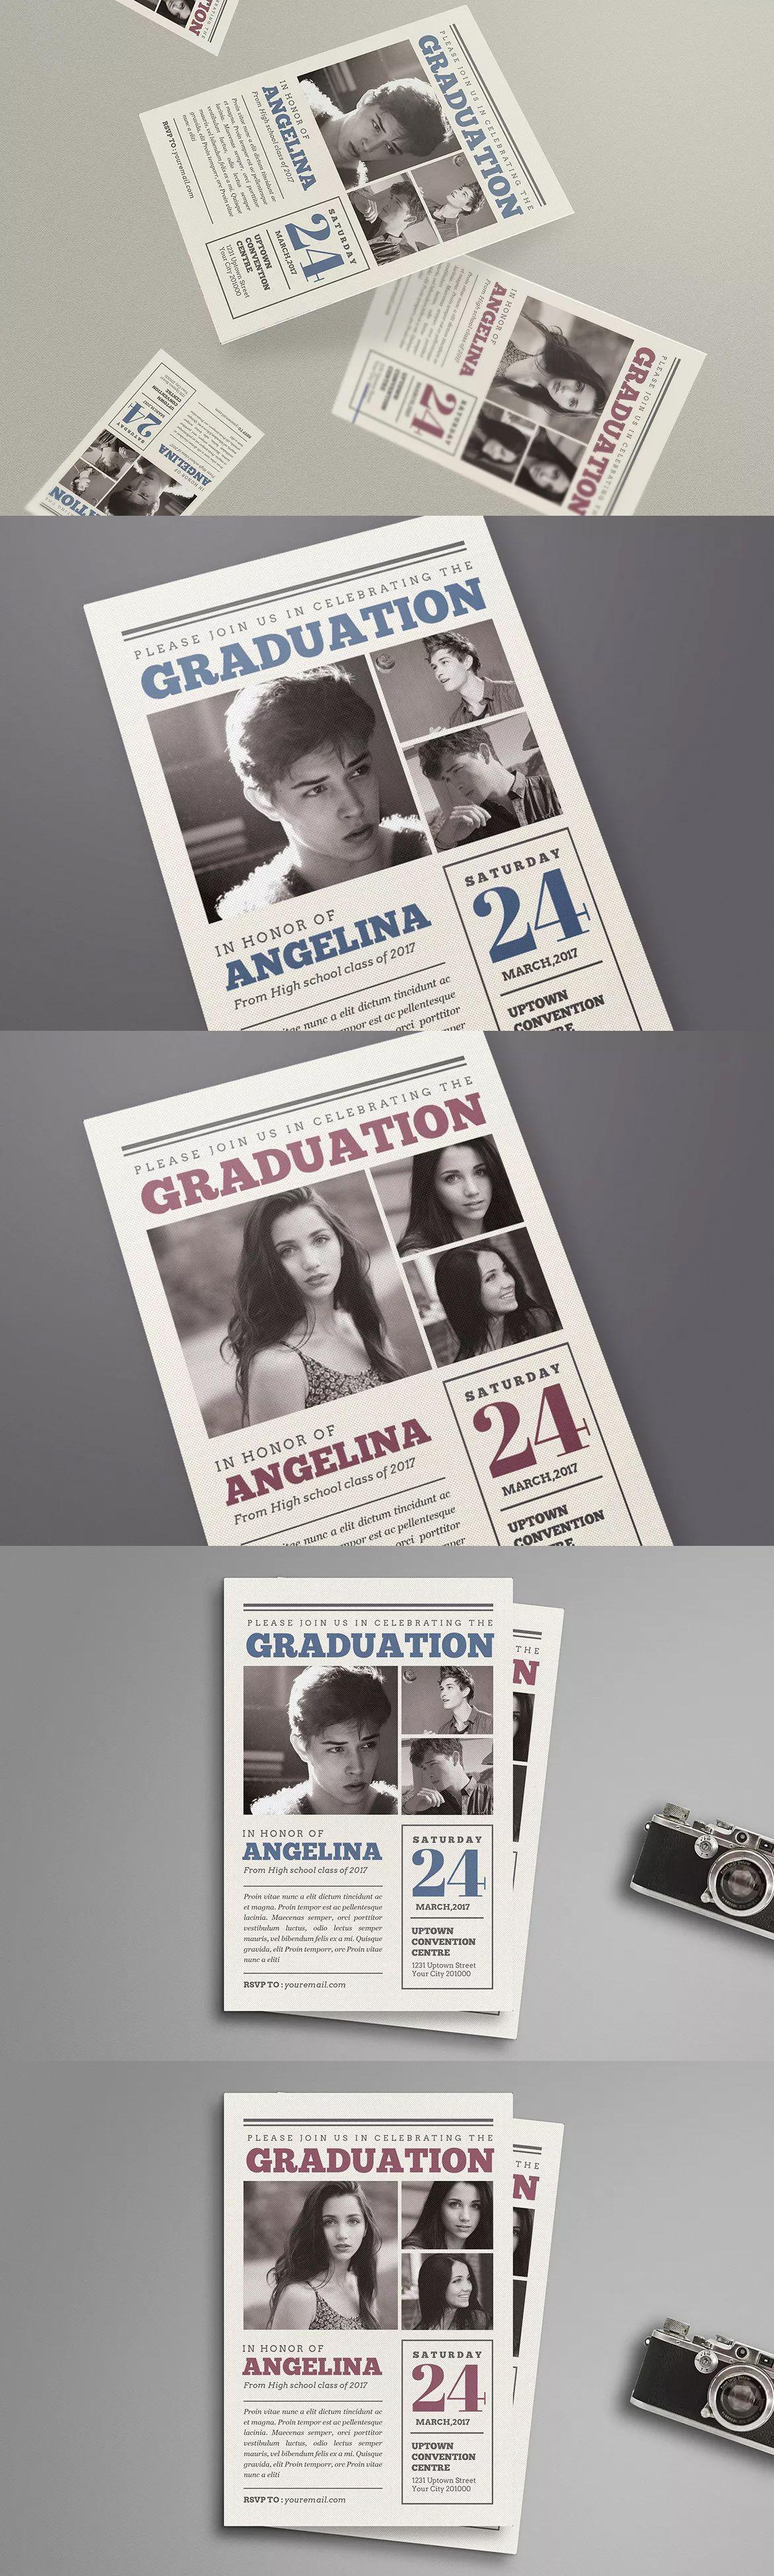 newspaper style graduation invitation template psd | invitation